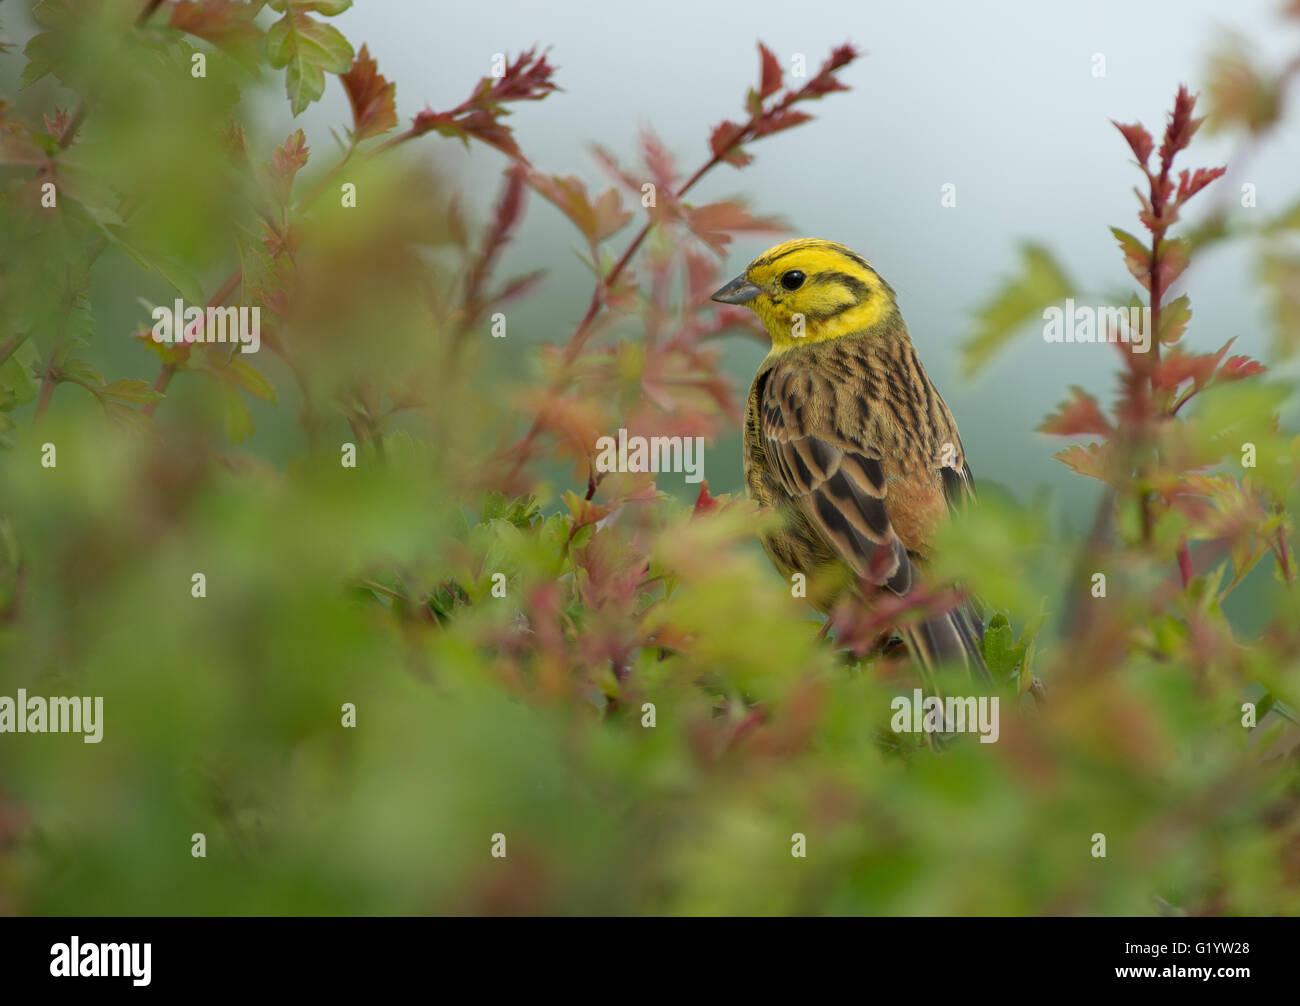 Male Yellowhammer-Emberiza citrinella. Spring. Uk - Stock Image